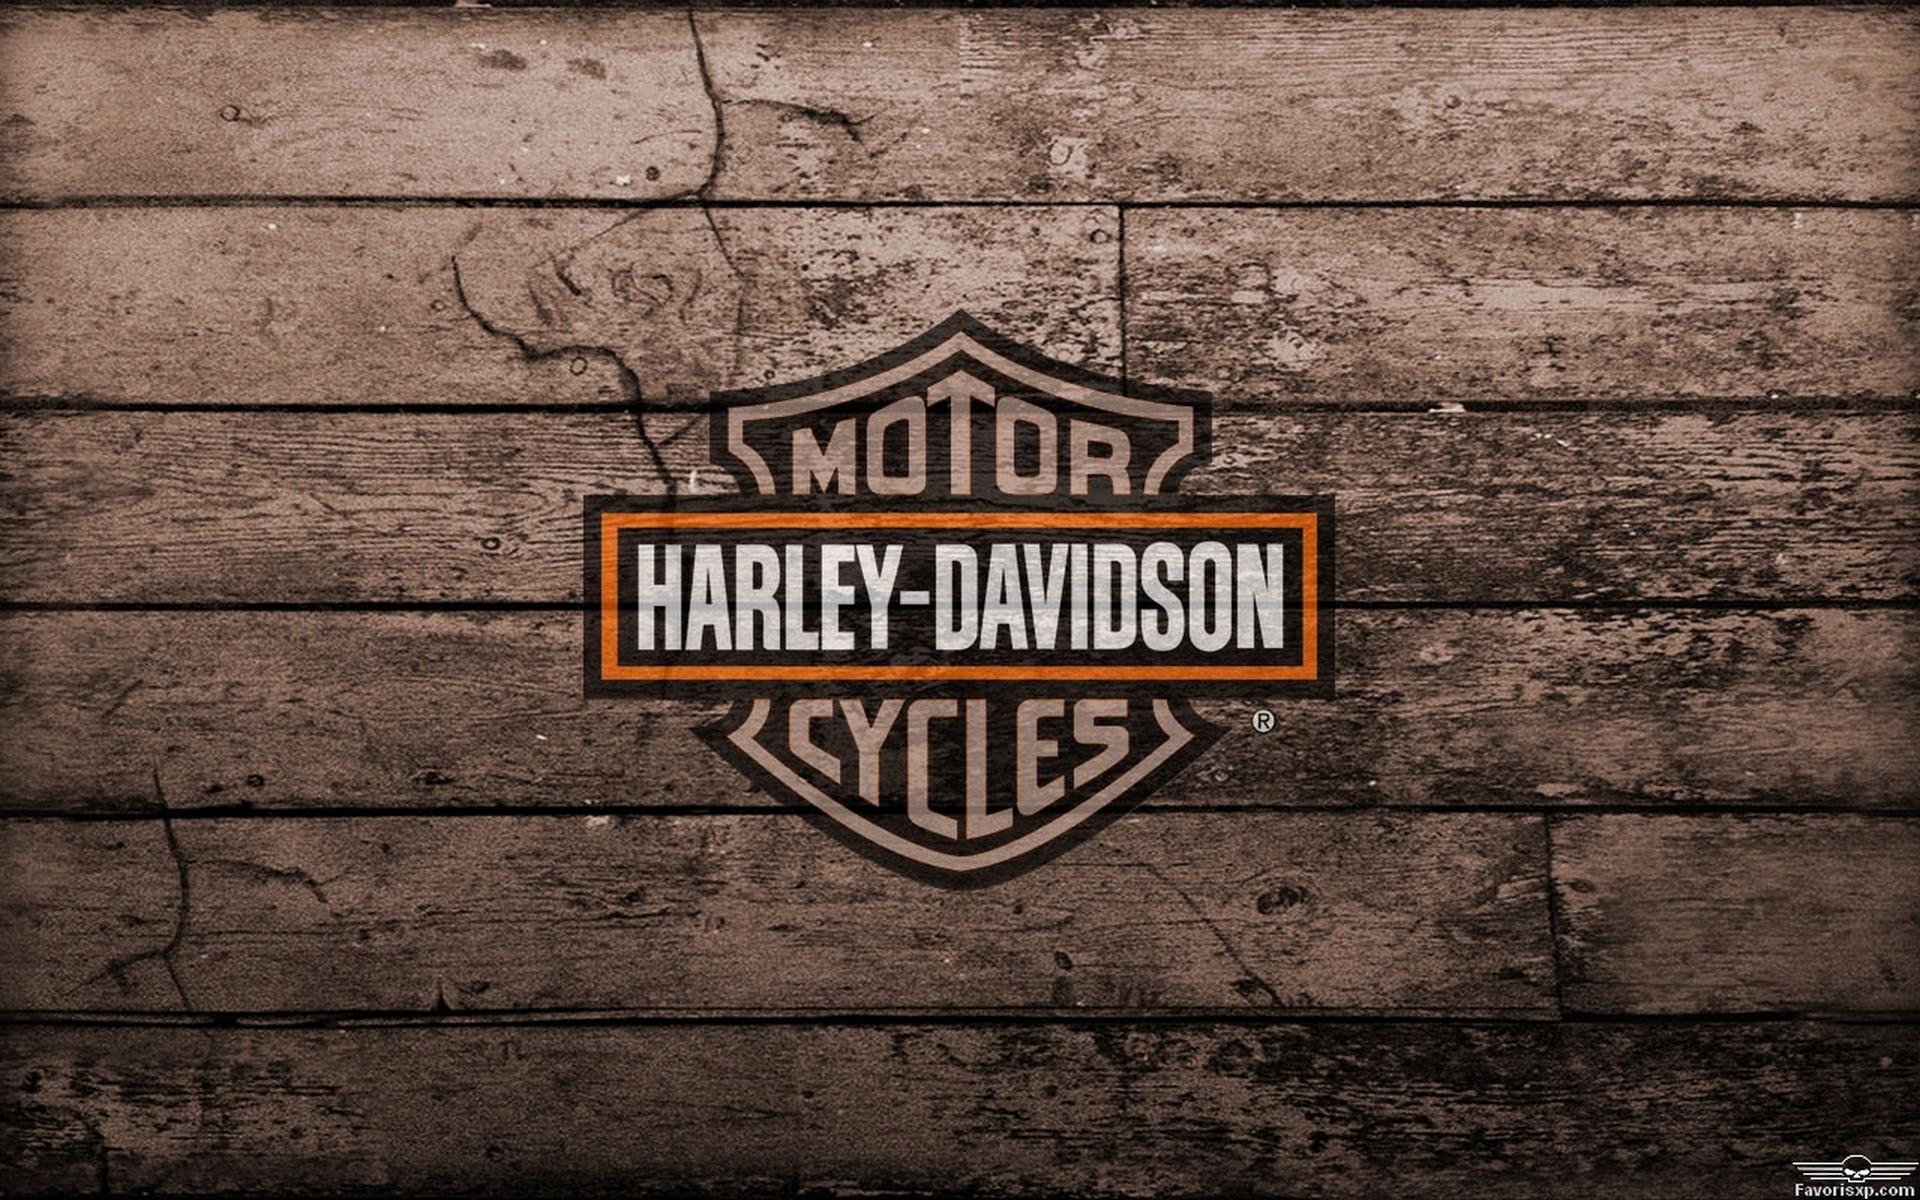 Harley Davidson logo wallpaper   1399588 1920x1200